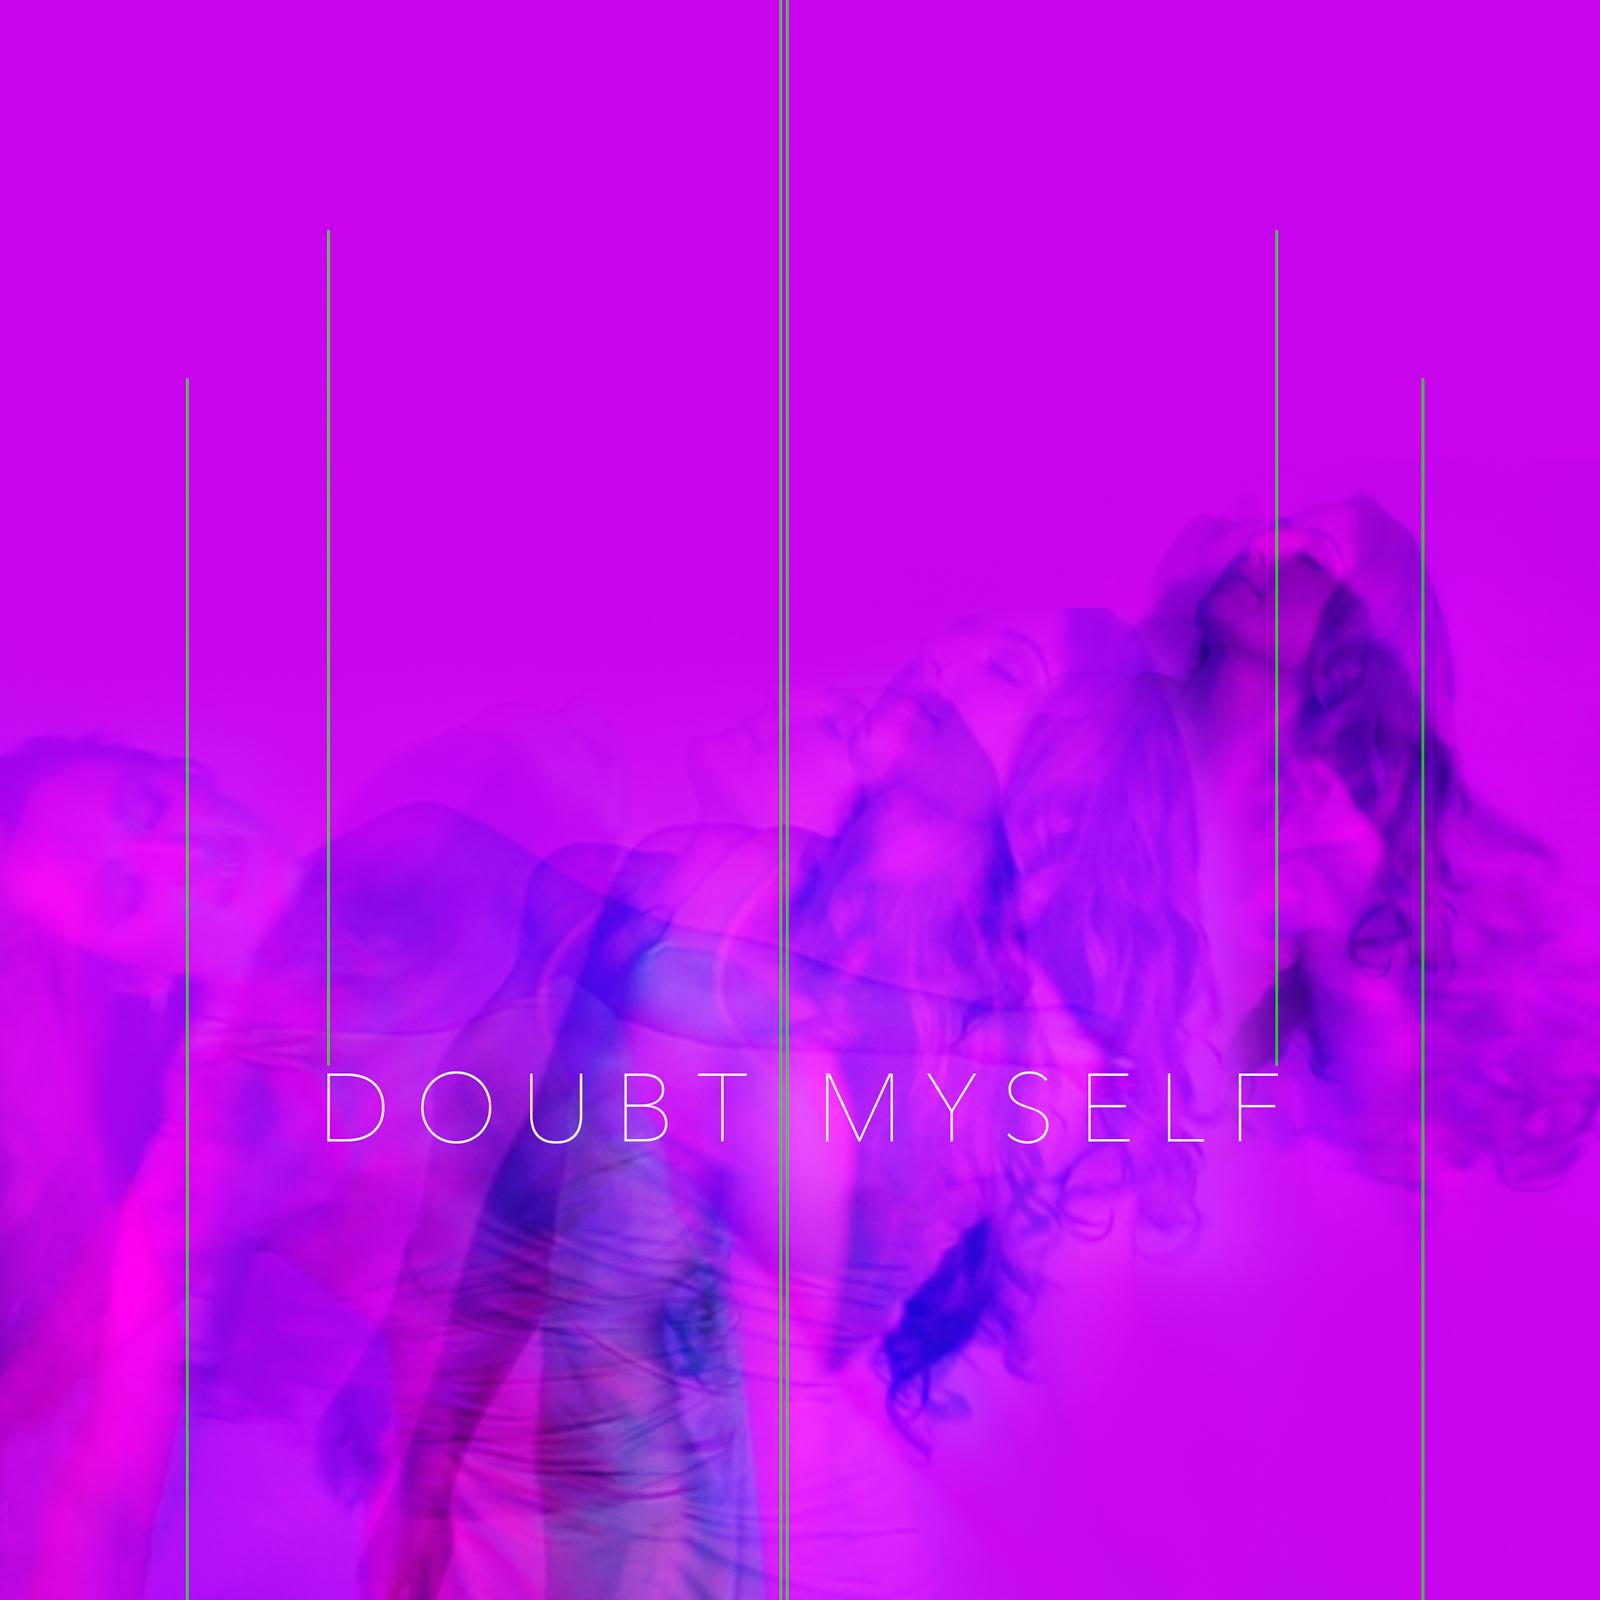 Doubt_Myself_cover_1600.jpg